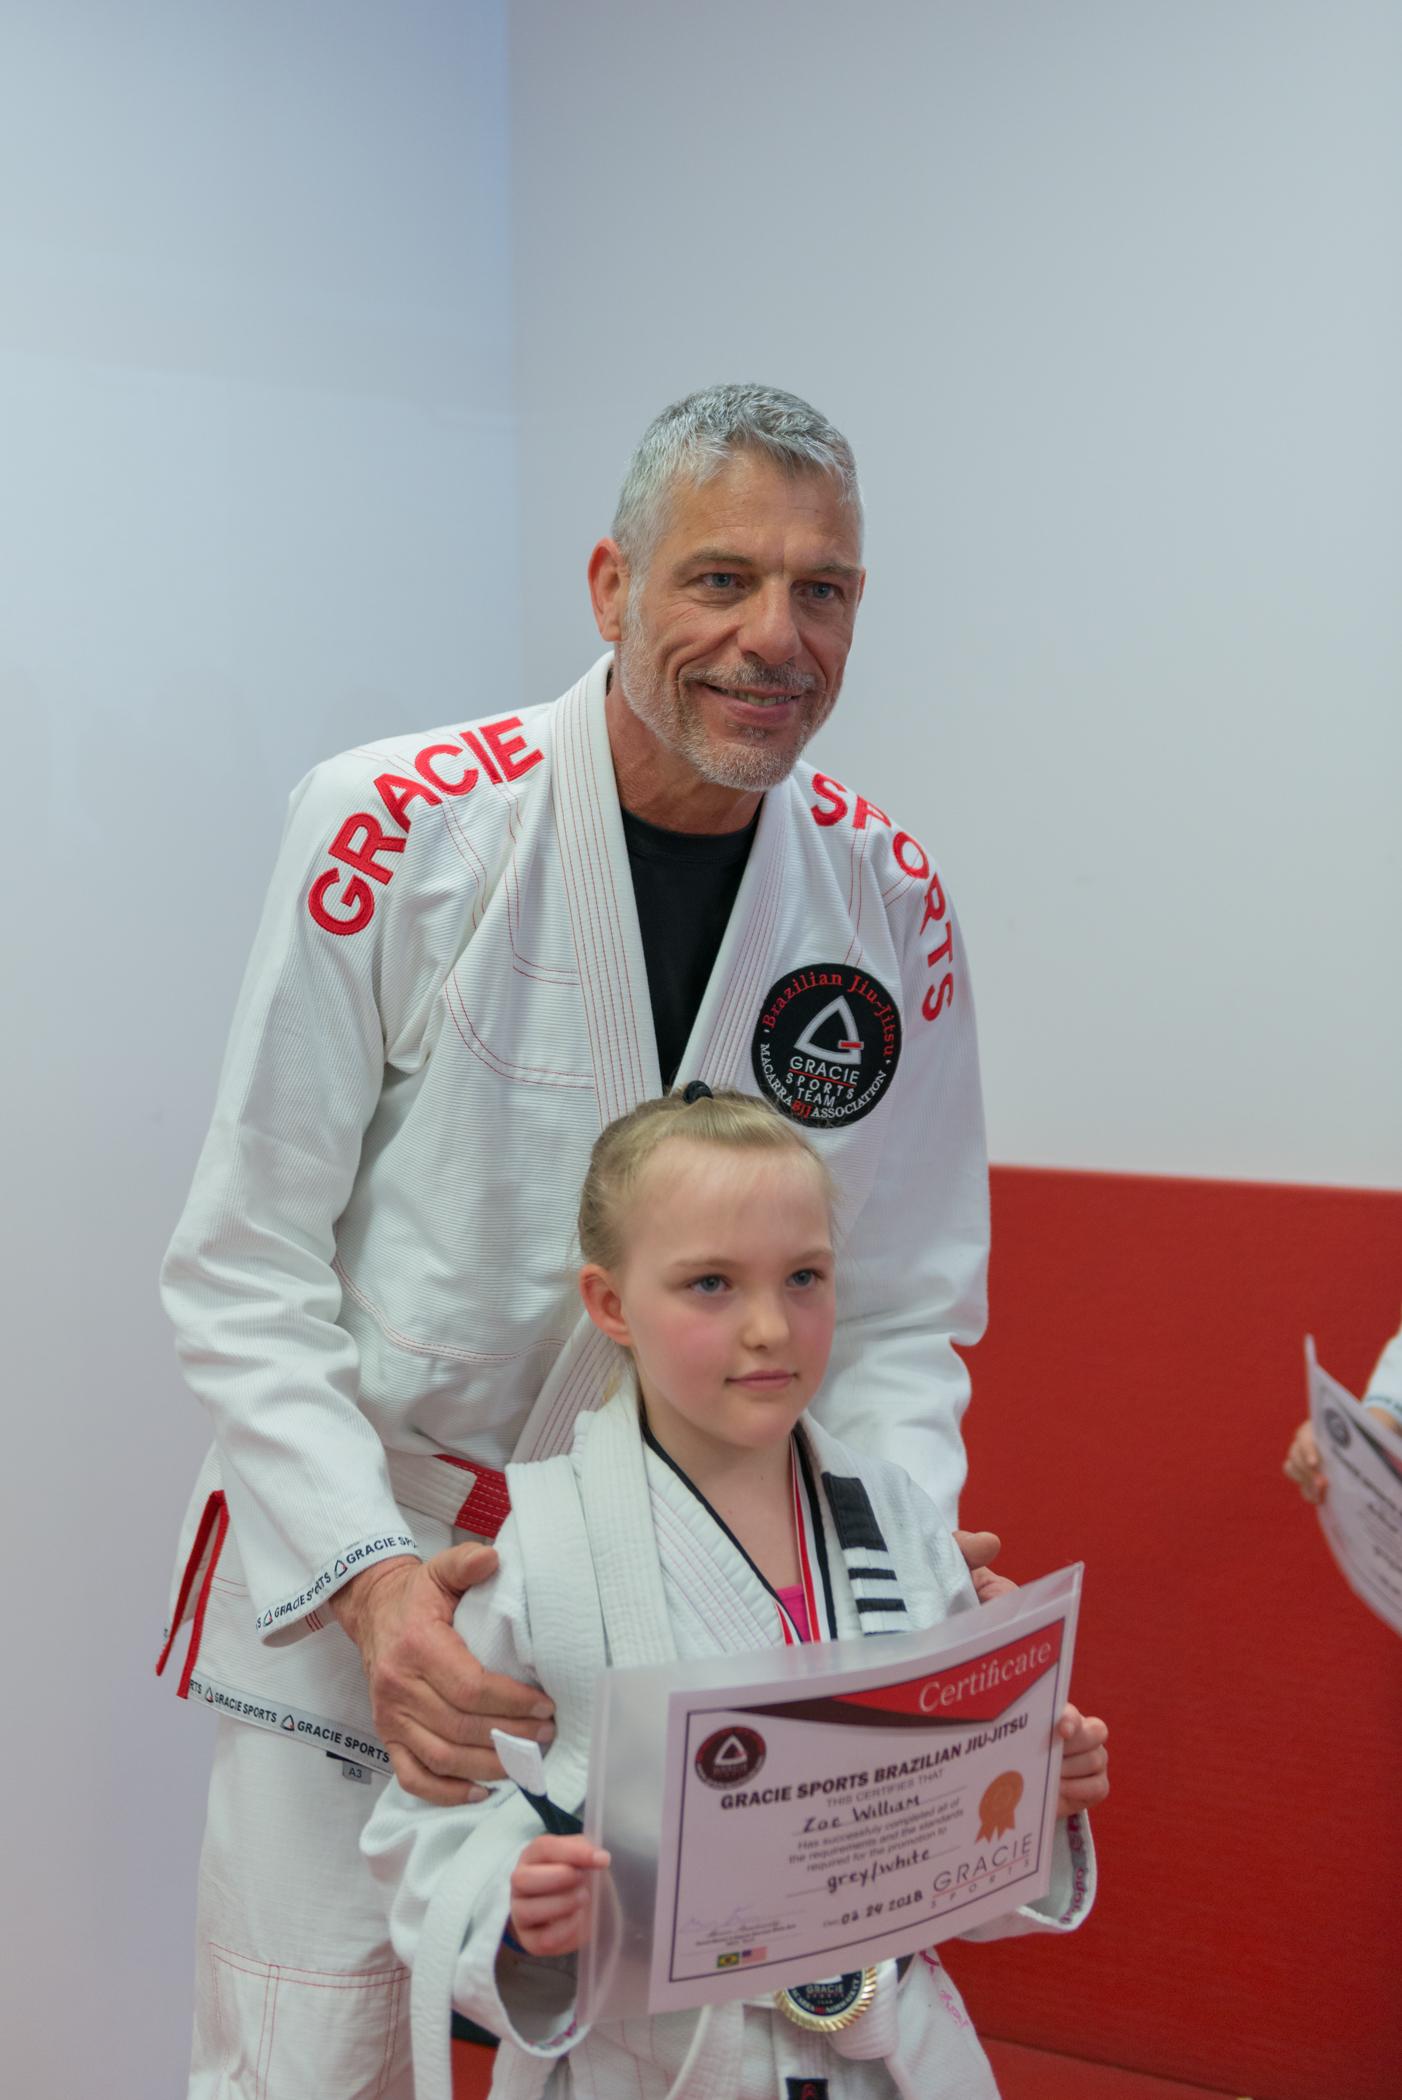 Gracie-Sports-Kids-158.jpg